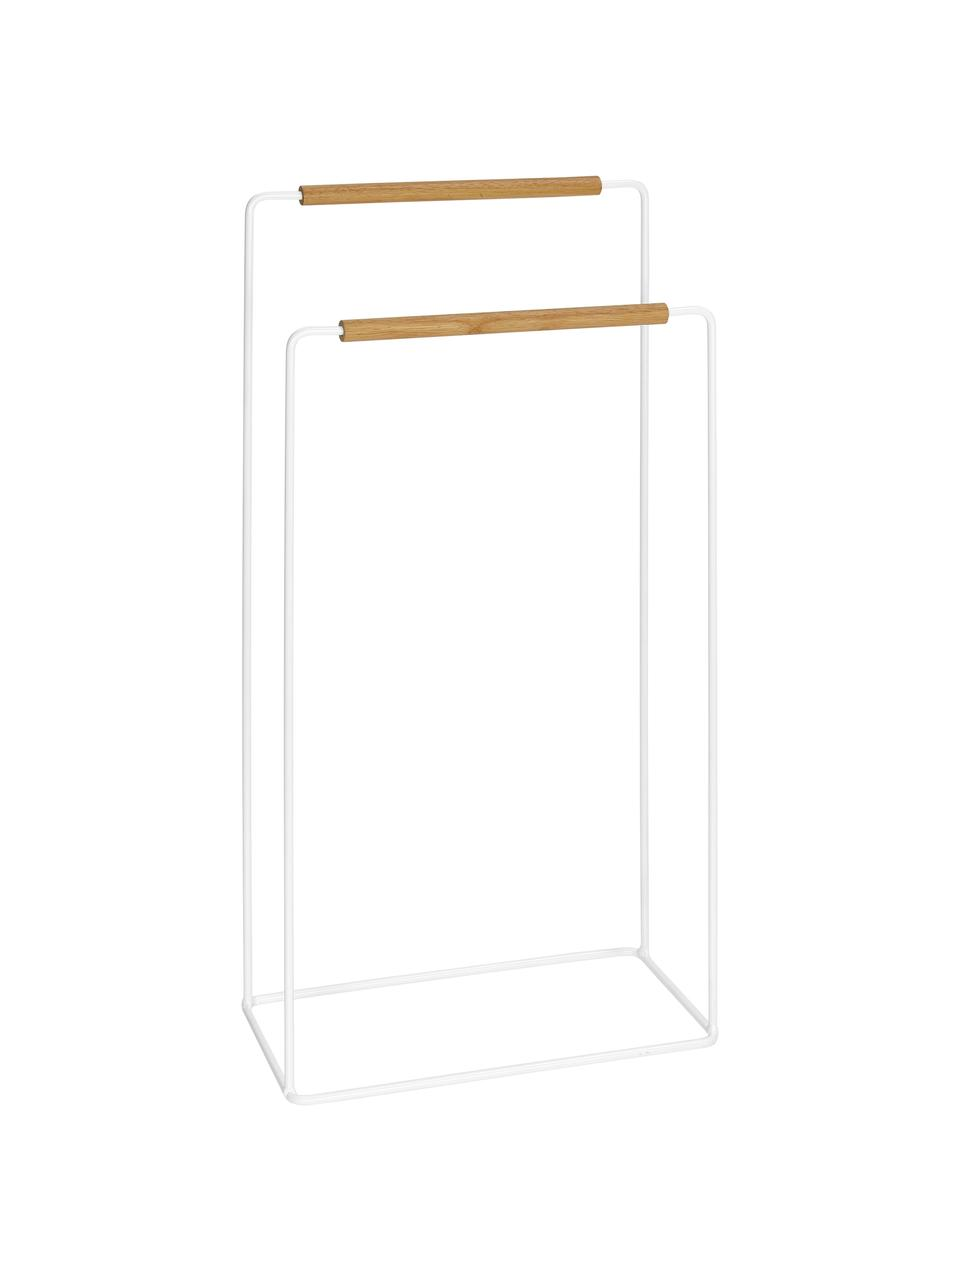 Handtuchhalter Barbican, Metall, Gummibaumholz, lackiert, Weiß, Gummibaumholz, 40 x 81 cm